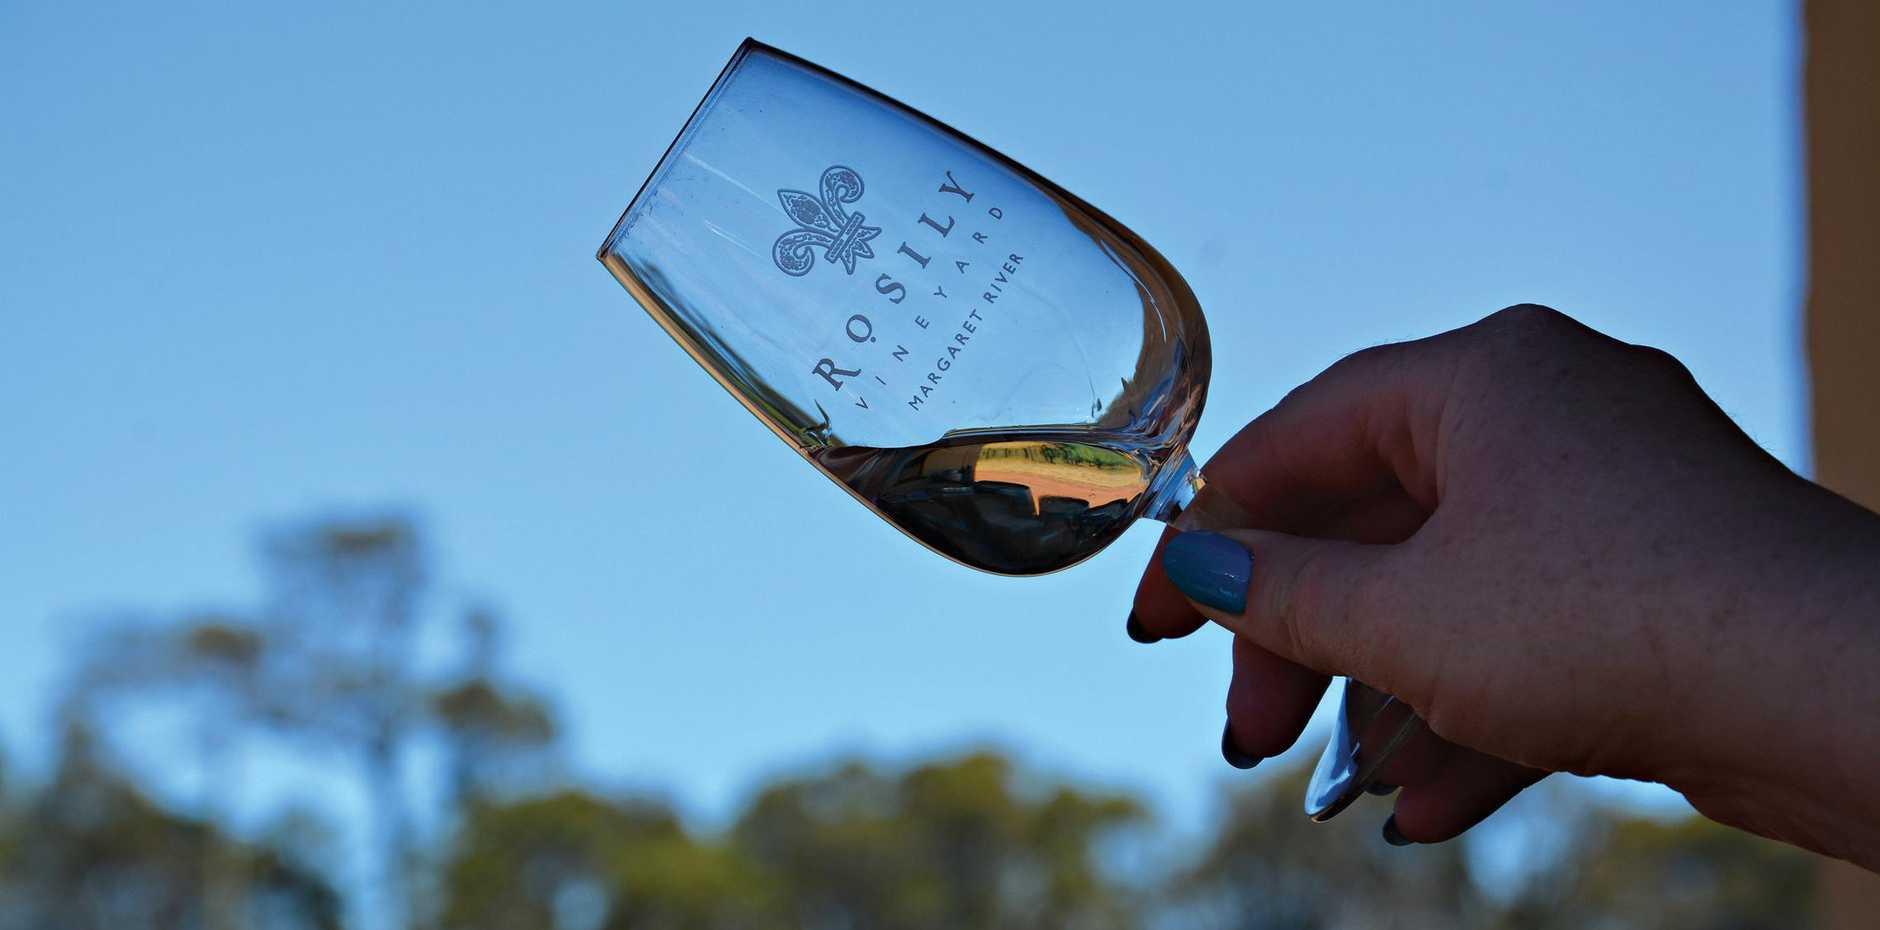 Tasting wine at Rosily winery in the Margaret River region in Western Australia.